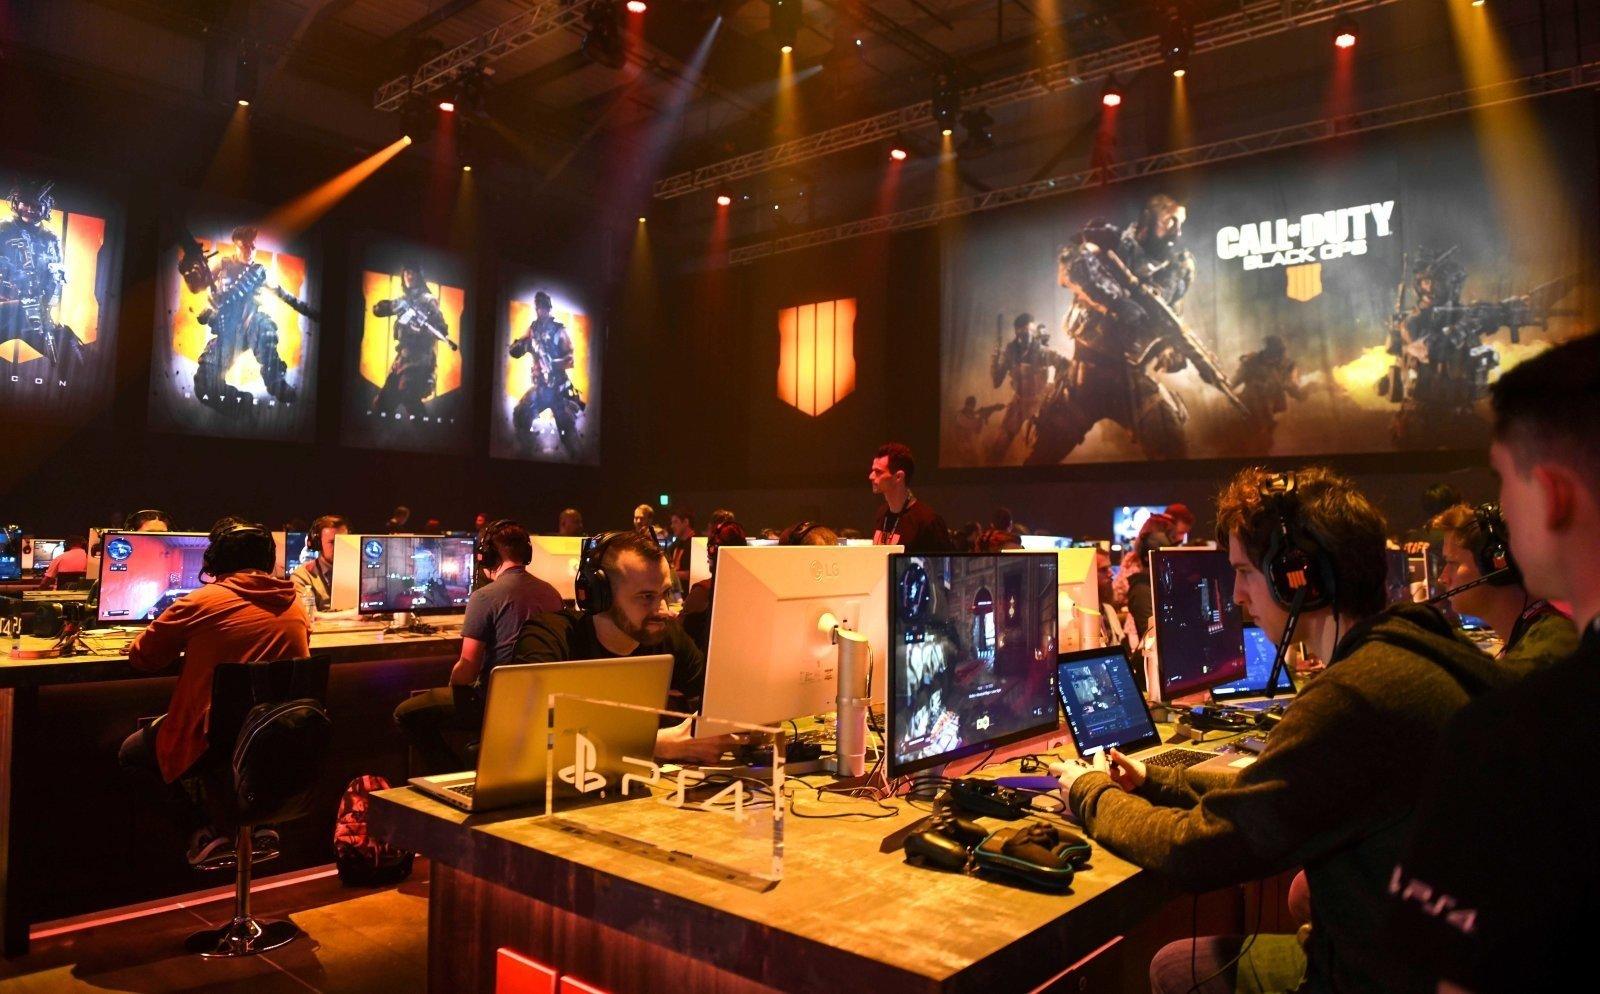 Лига по Call Of Duty от Blizzard и слоты по 25 миллионов долларов